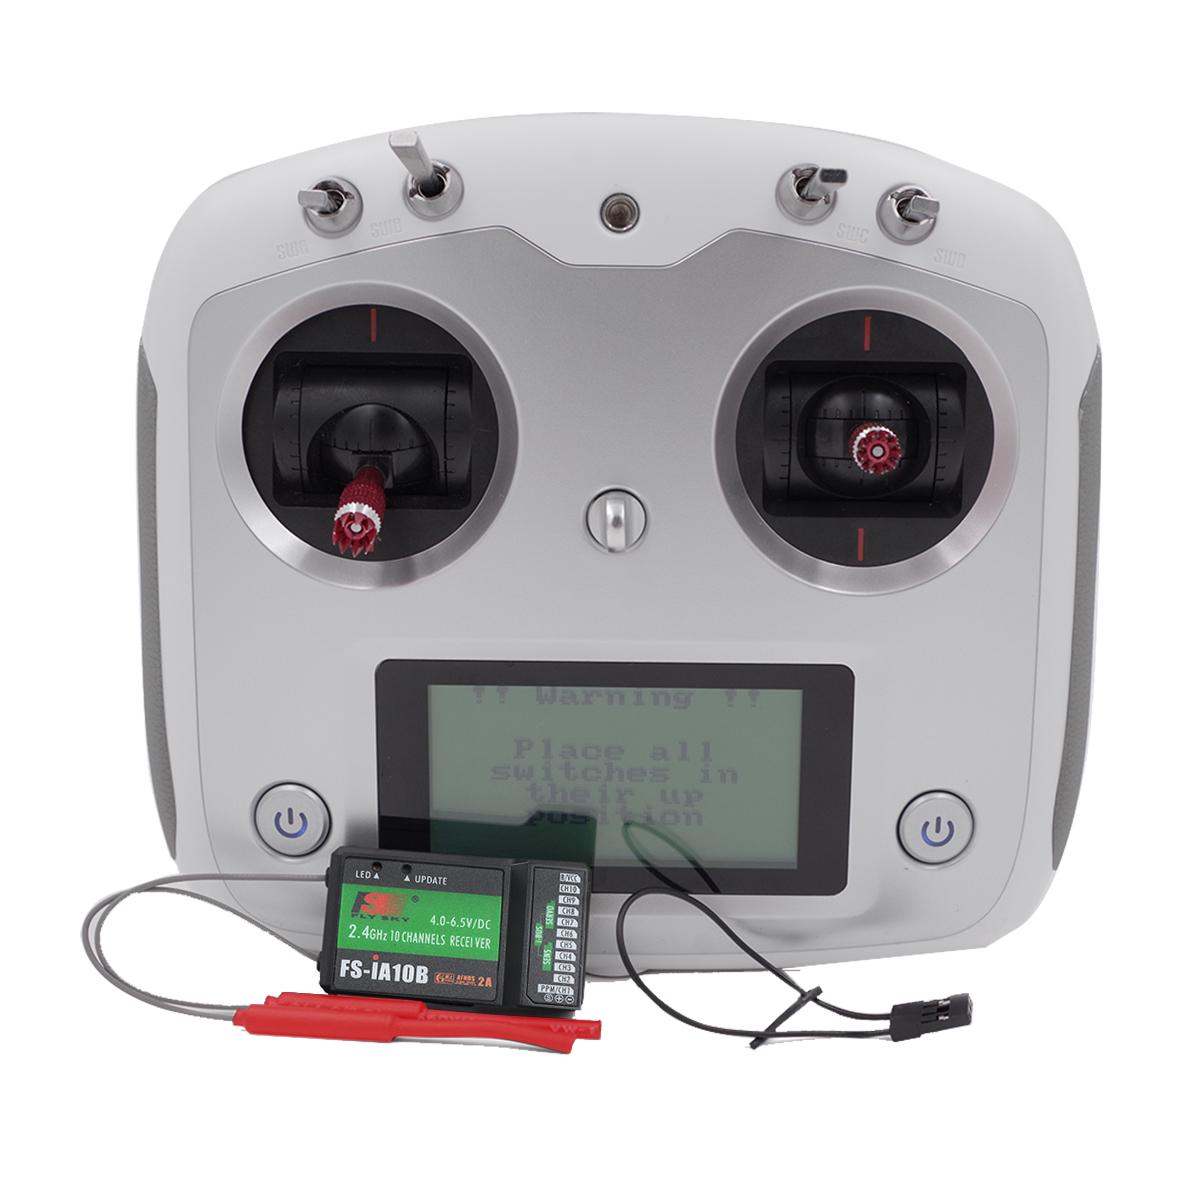 Flysky FS-i6S 2.4G 10ch RC Transmitter Controller w/ 6ch FS-iA6B Receiver or 10ch FS-iA10B receiver white_FS-i6S+IA10B